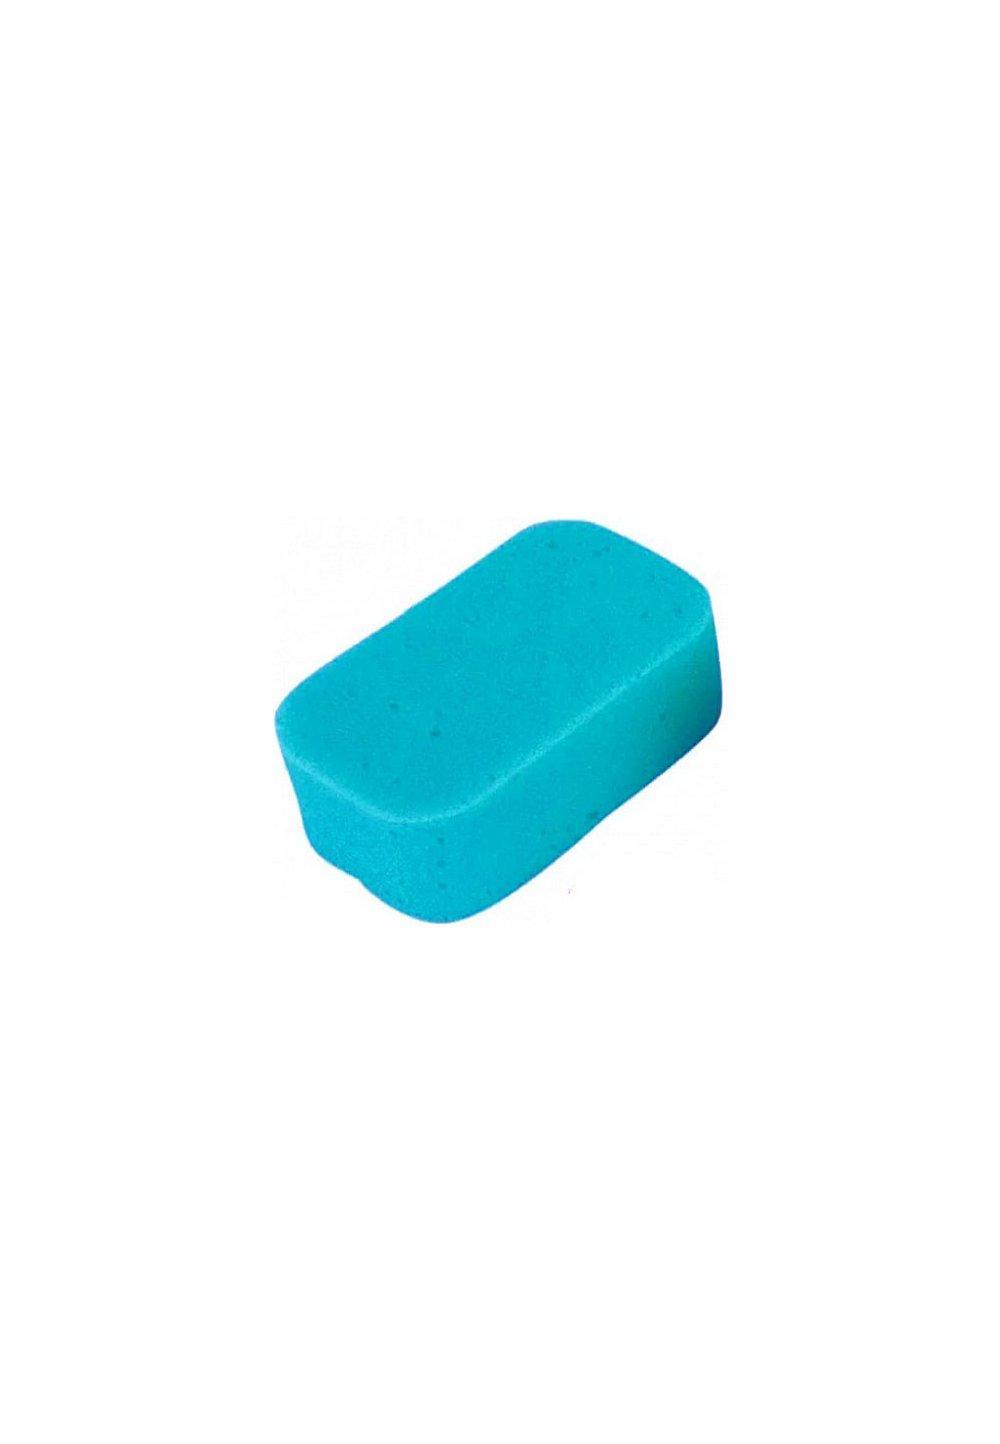 Burete de baie, albastru deschis, Canpol imagine